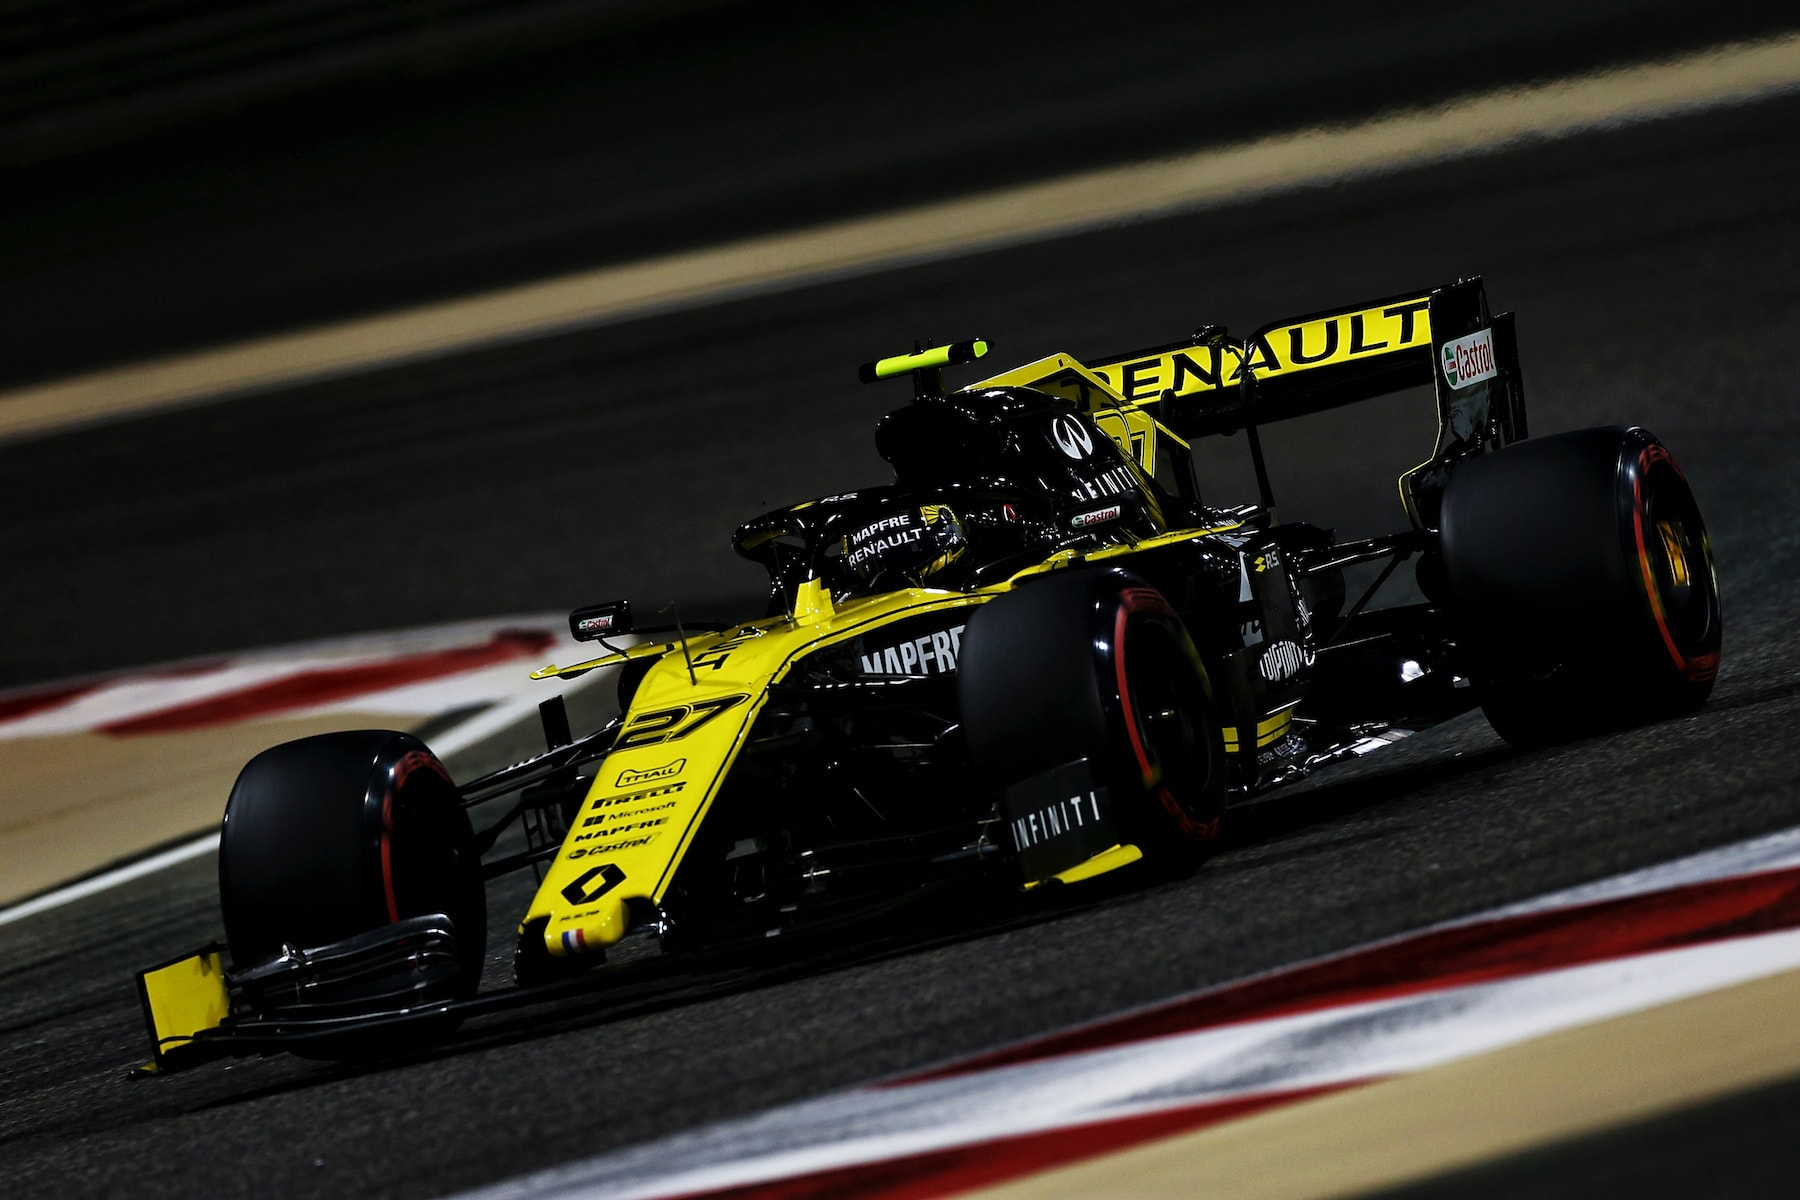 2 10 11 2019 Nico Hulkenberg | Renault RS19 | 2019 Bahrain GP 1 copy.jpg